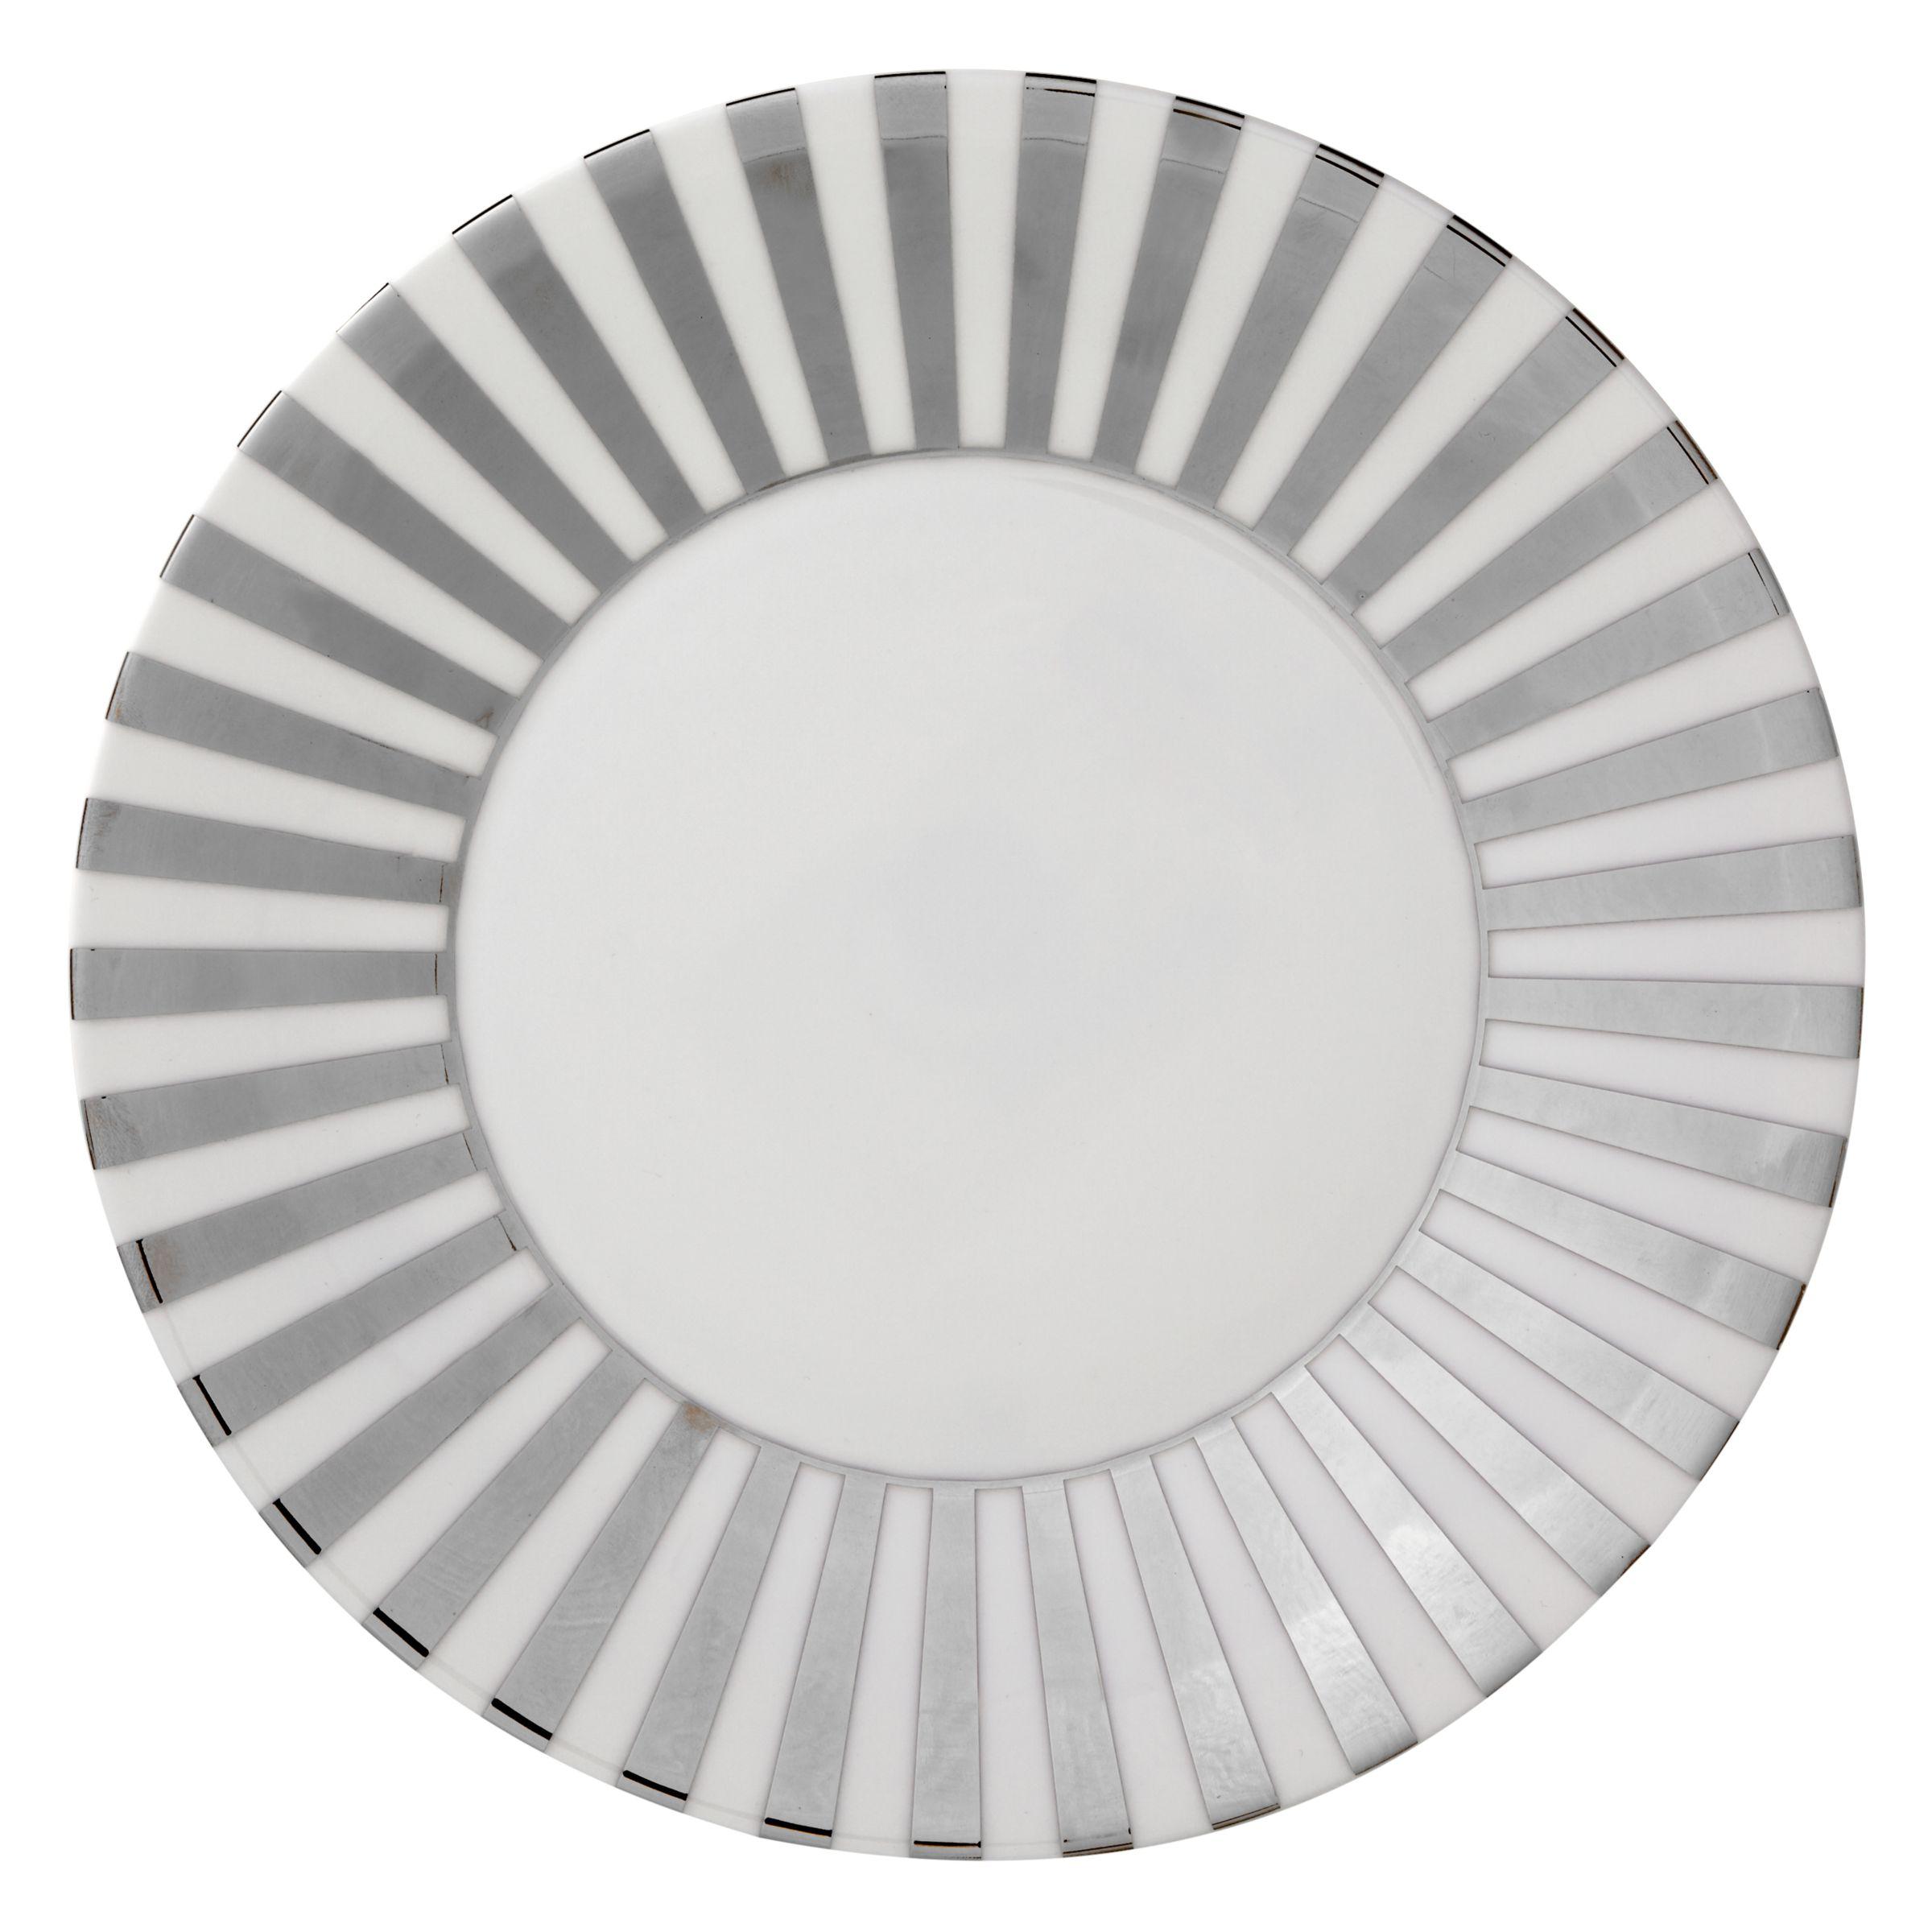 Jasper Conran Jasper Conran for Wedgwood Platinum Striped 23cm Plate